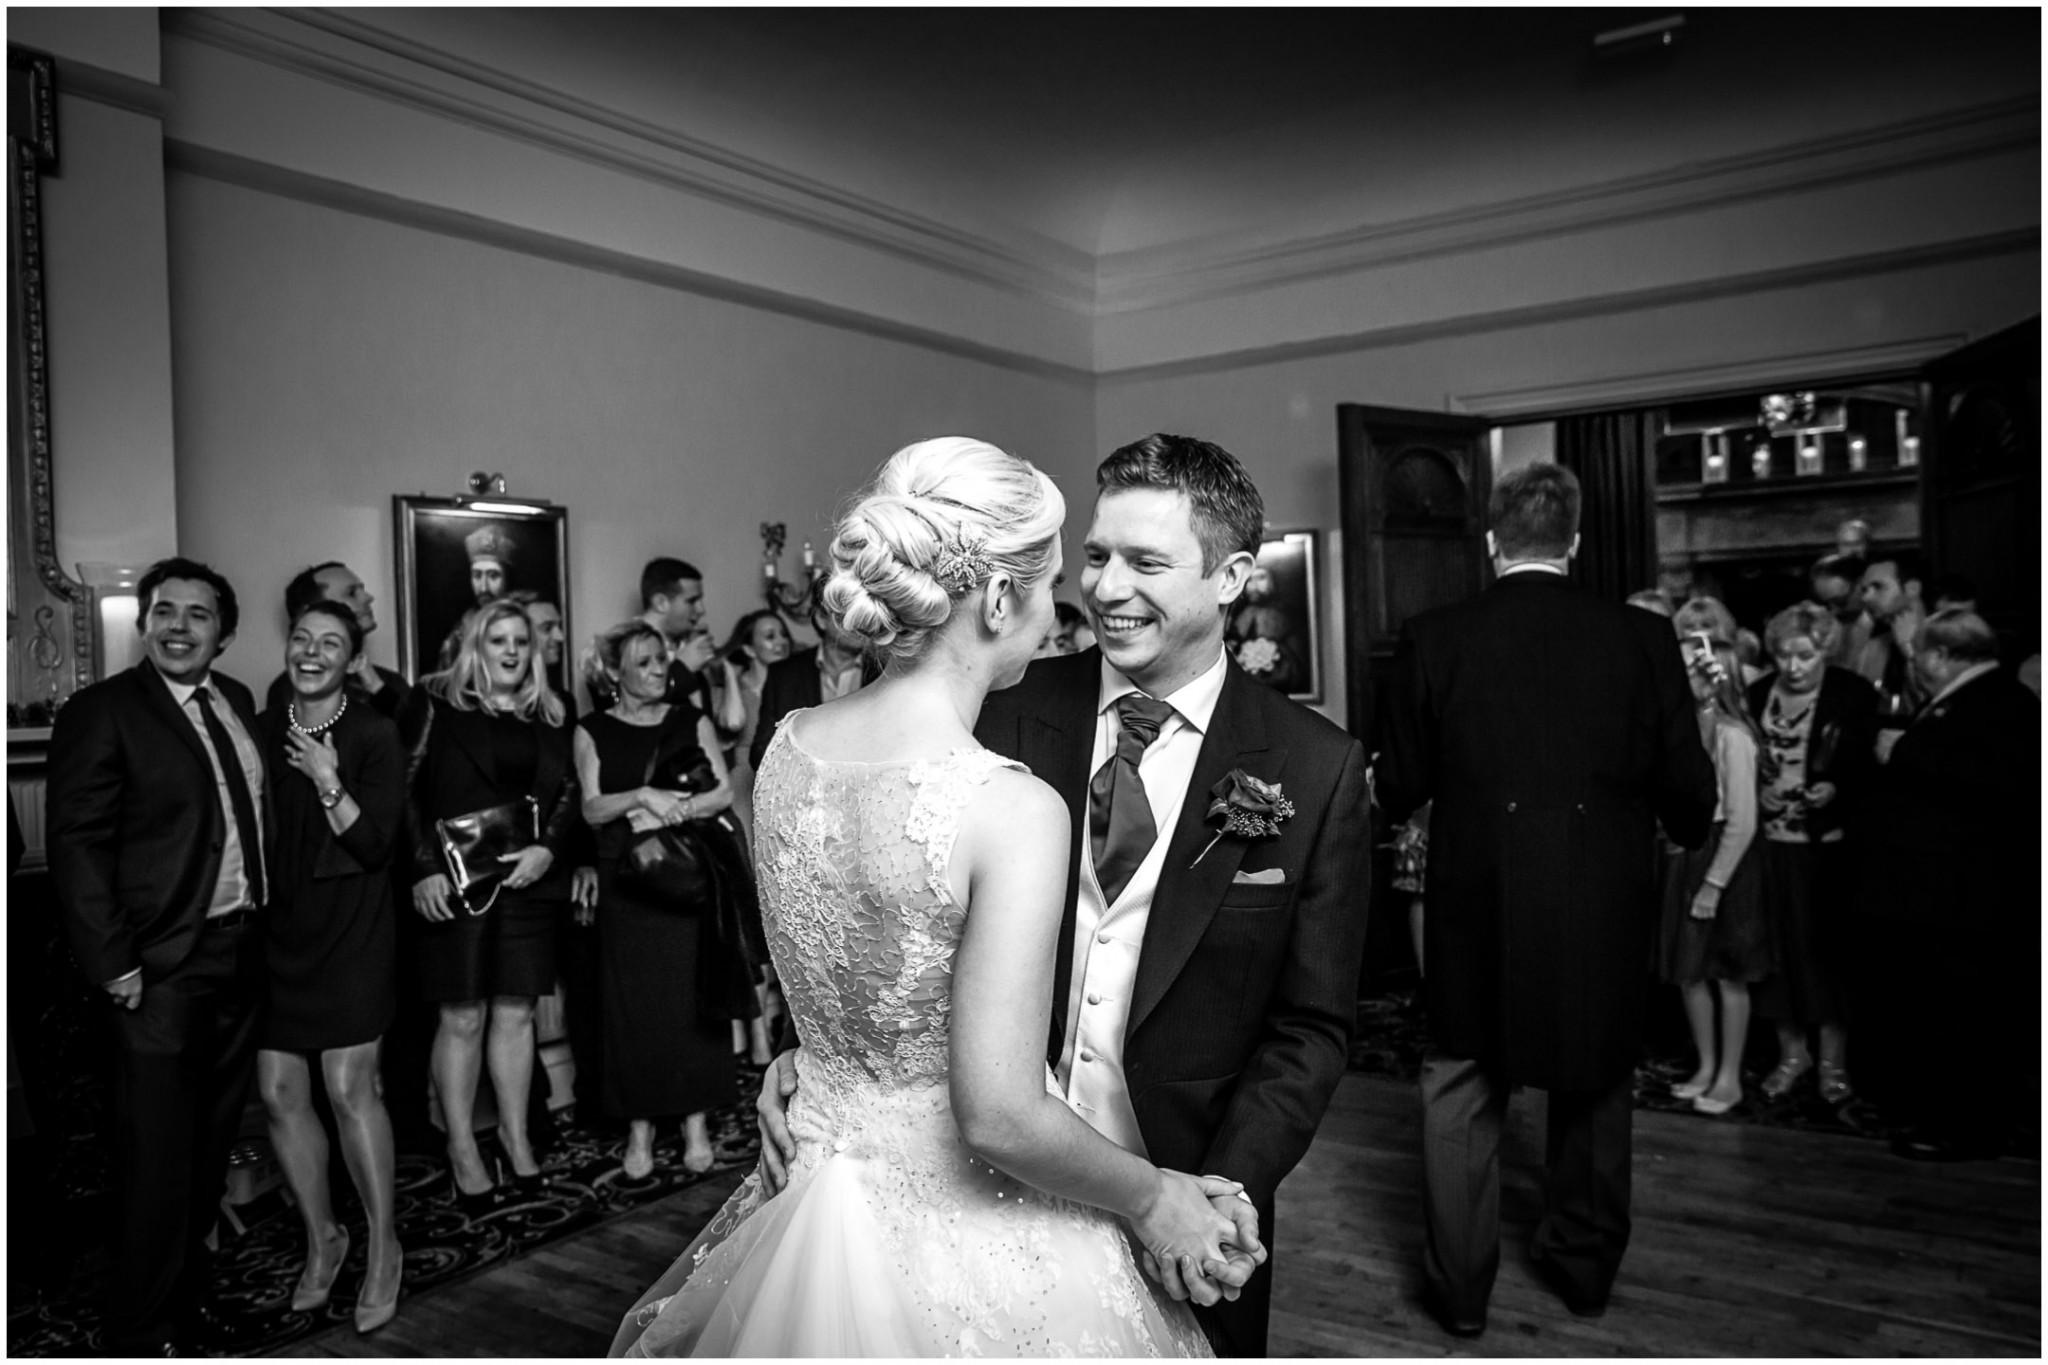 Rhinefield House Wedding Bride & Groom's first dance